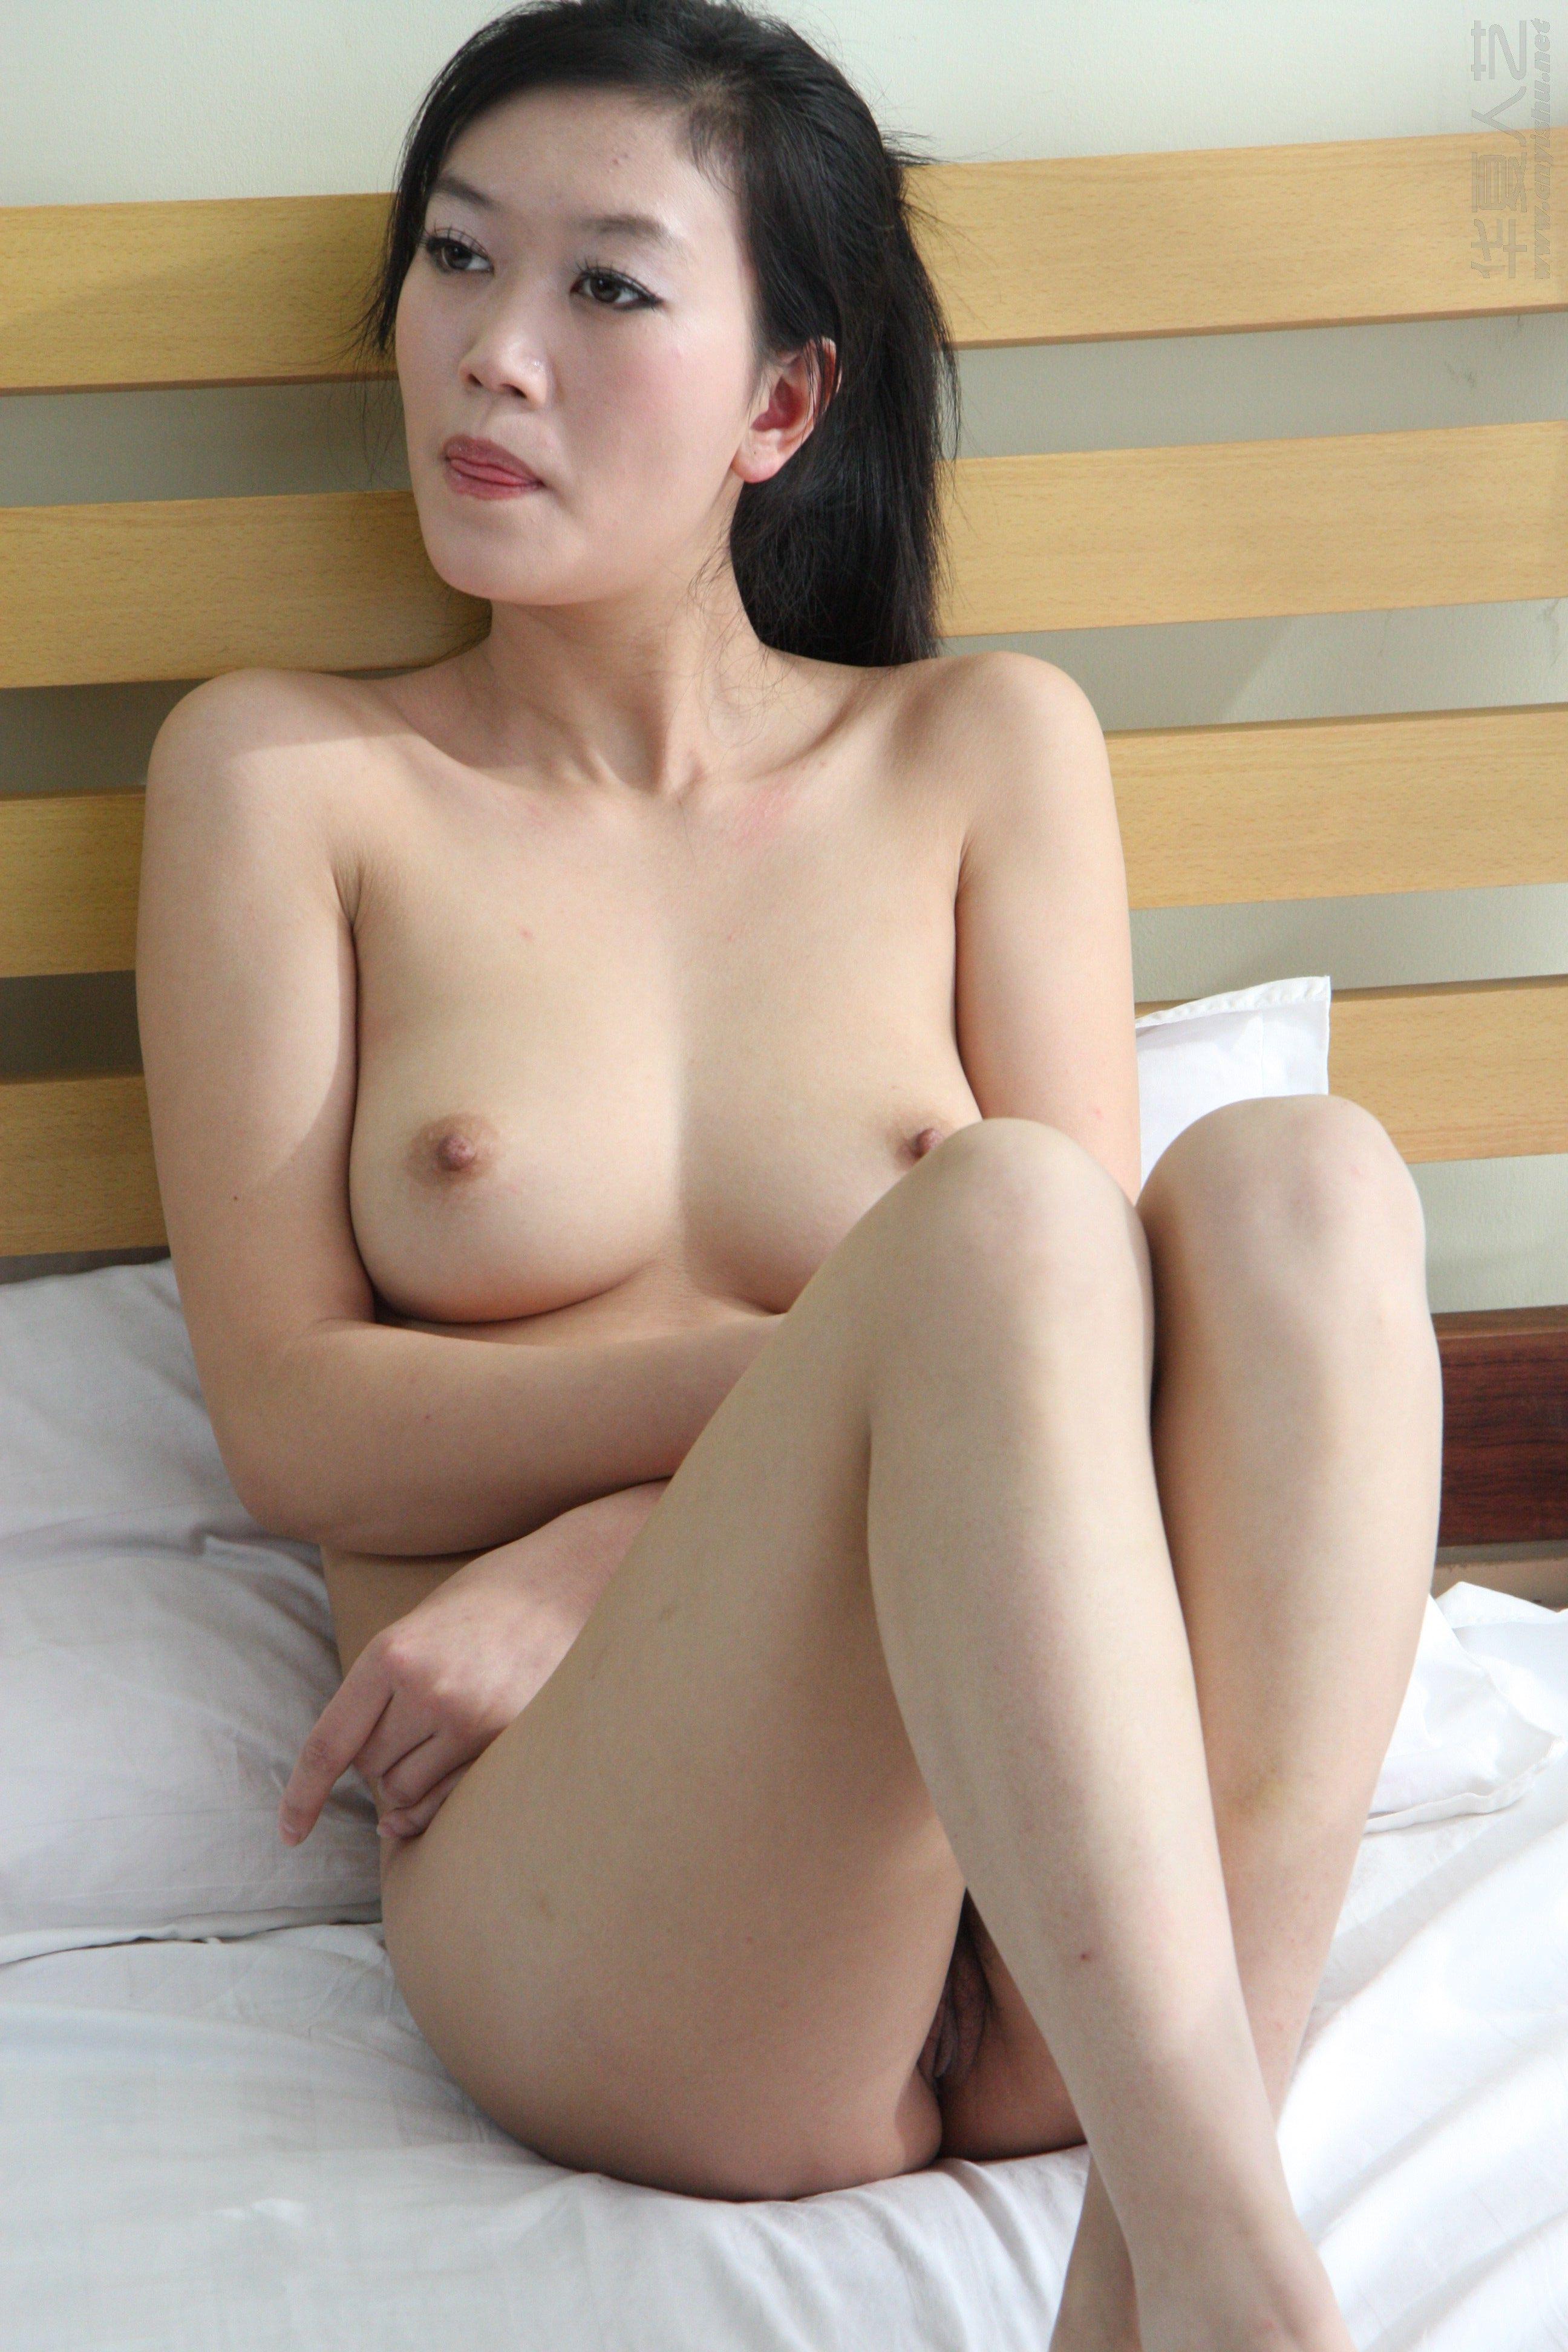 Girl naked china citydays.ro: Free